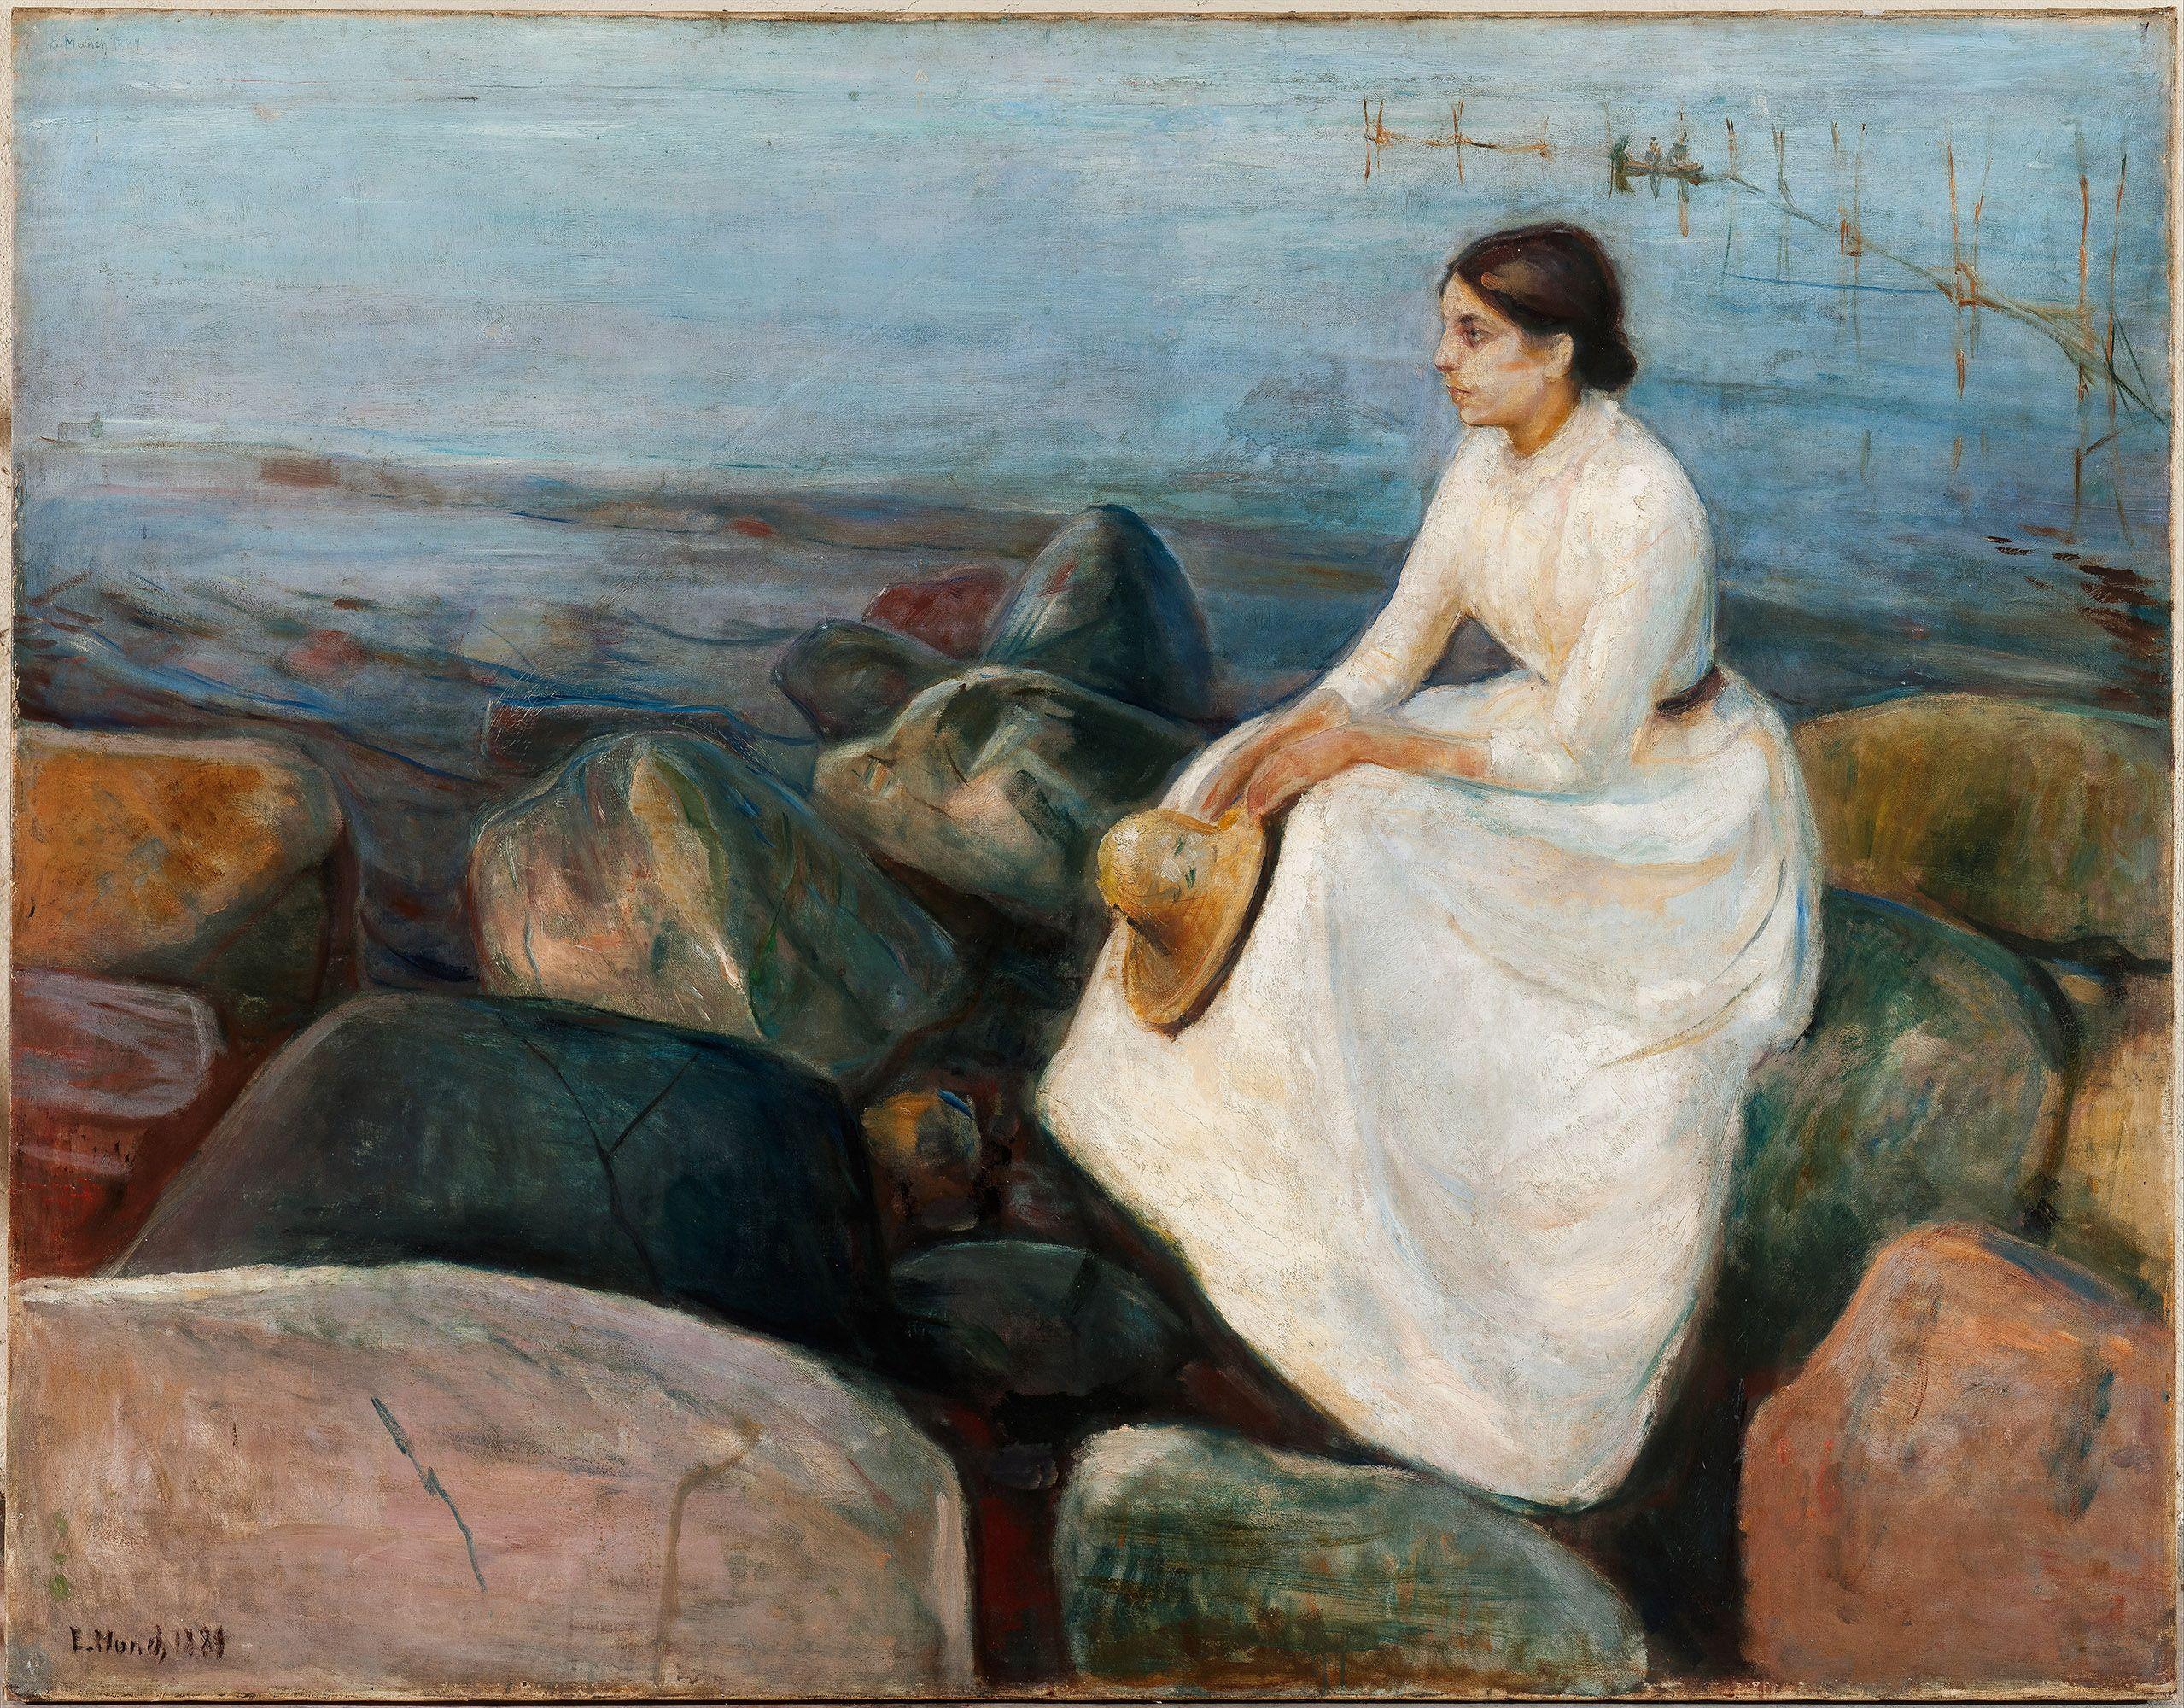 Summer Night Inger On The Beach Edvard Munch 1889 Kode Art Museum Of Bergen Public Domain Edvard Munch Painting Artist